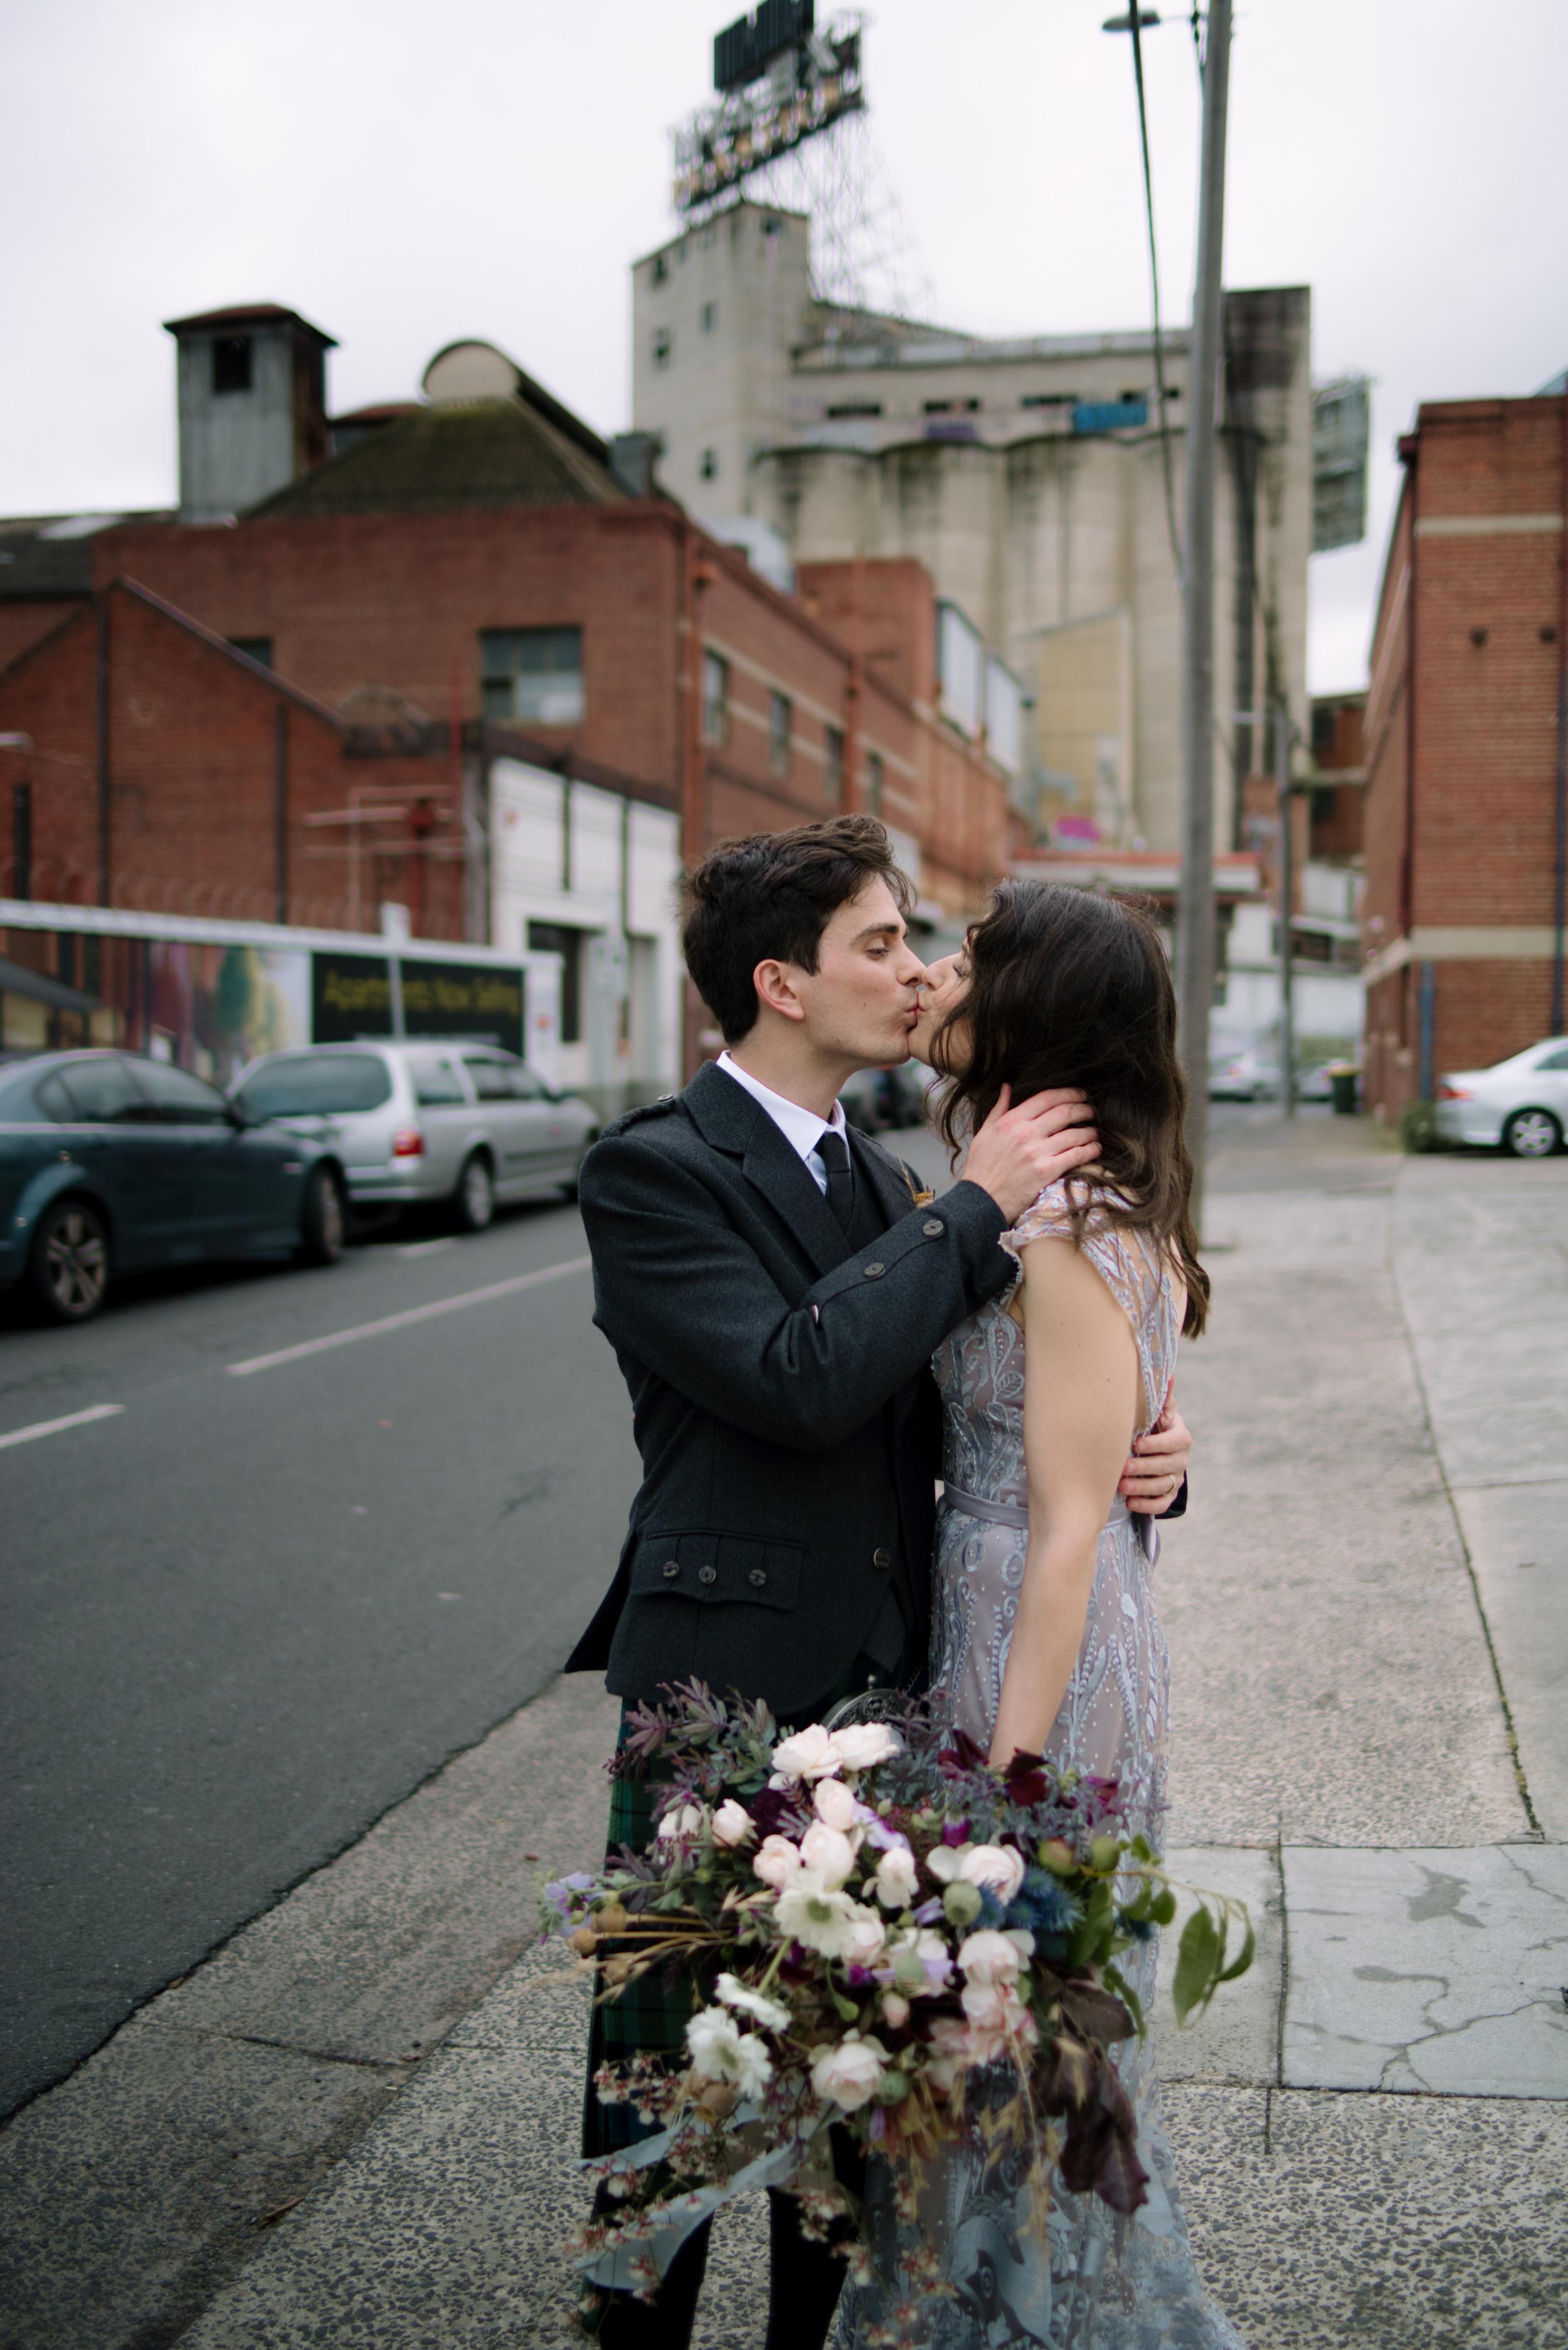 I-Got-You-Babe-&.Co.-Glasshaus-Wedding-Charlotte-Cameron0106.JPG